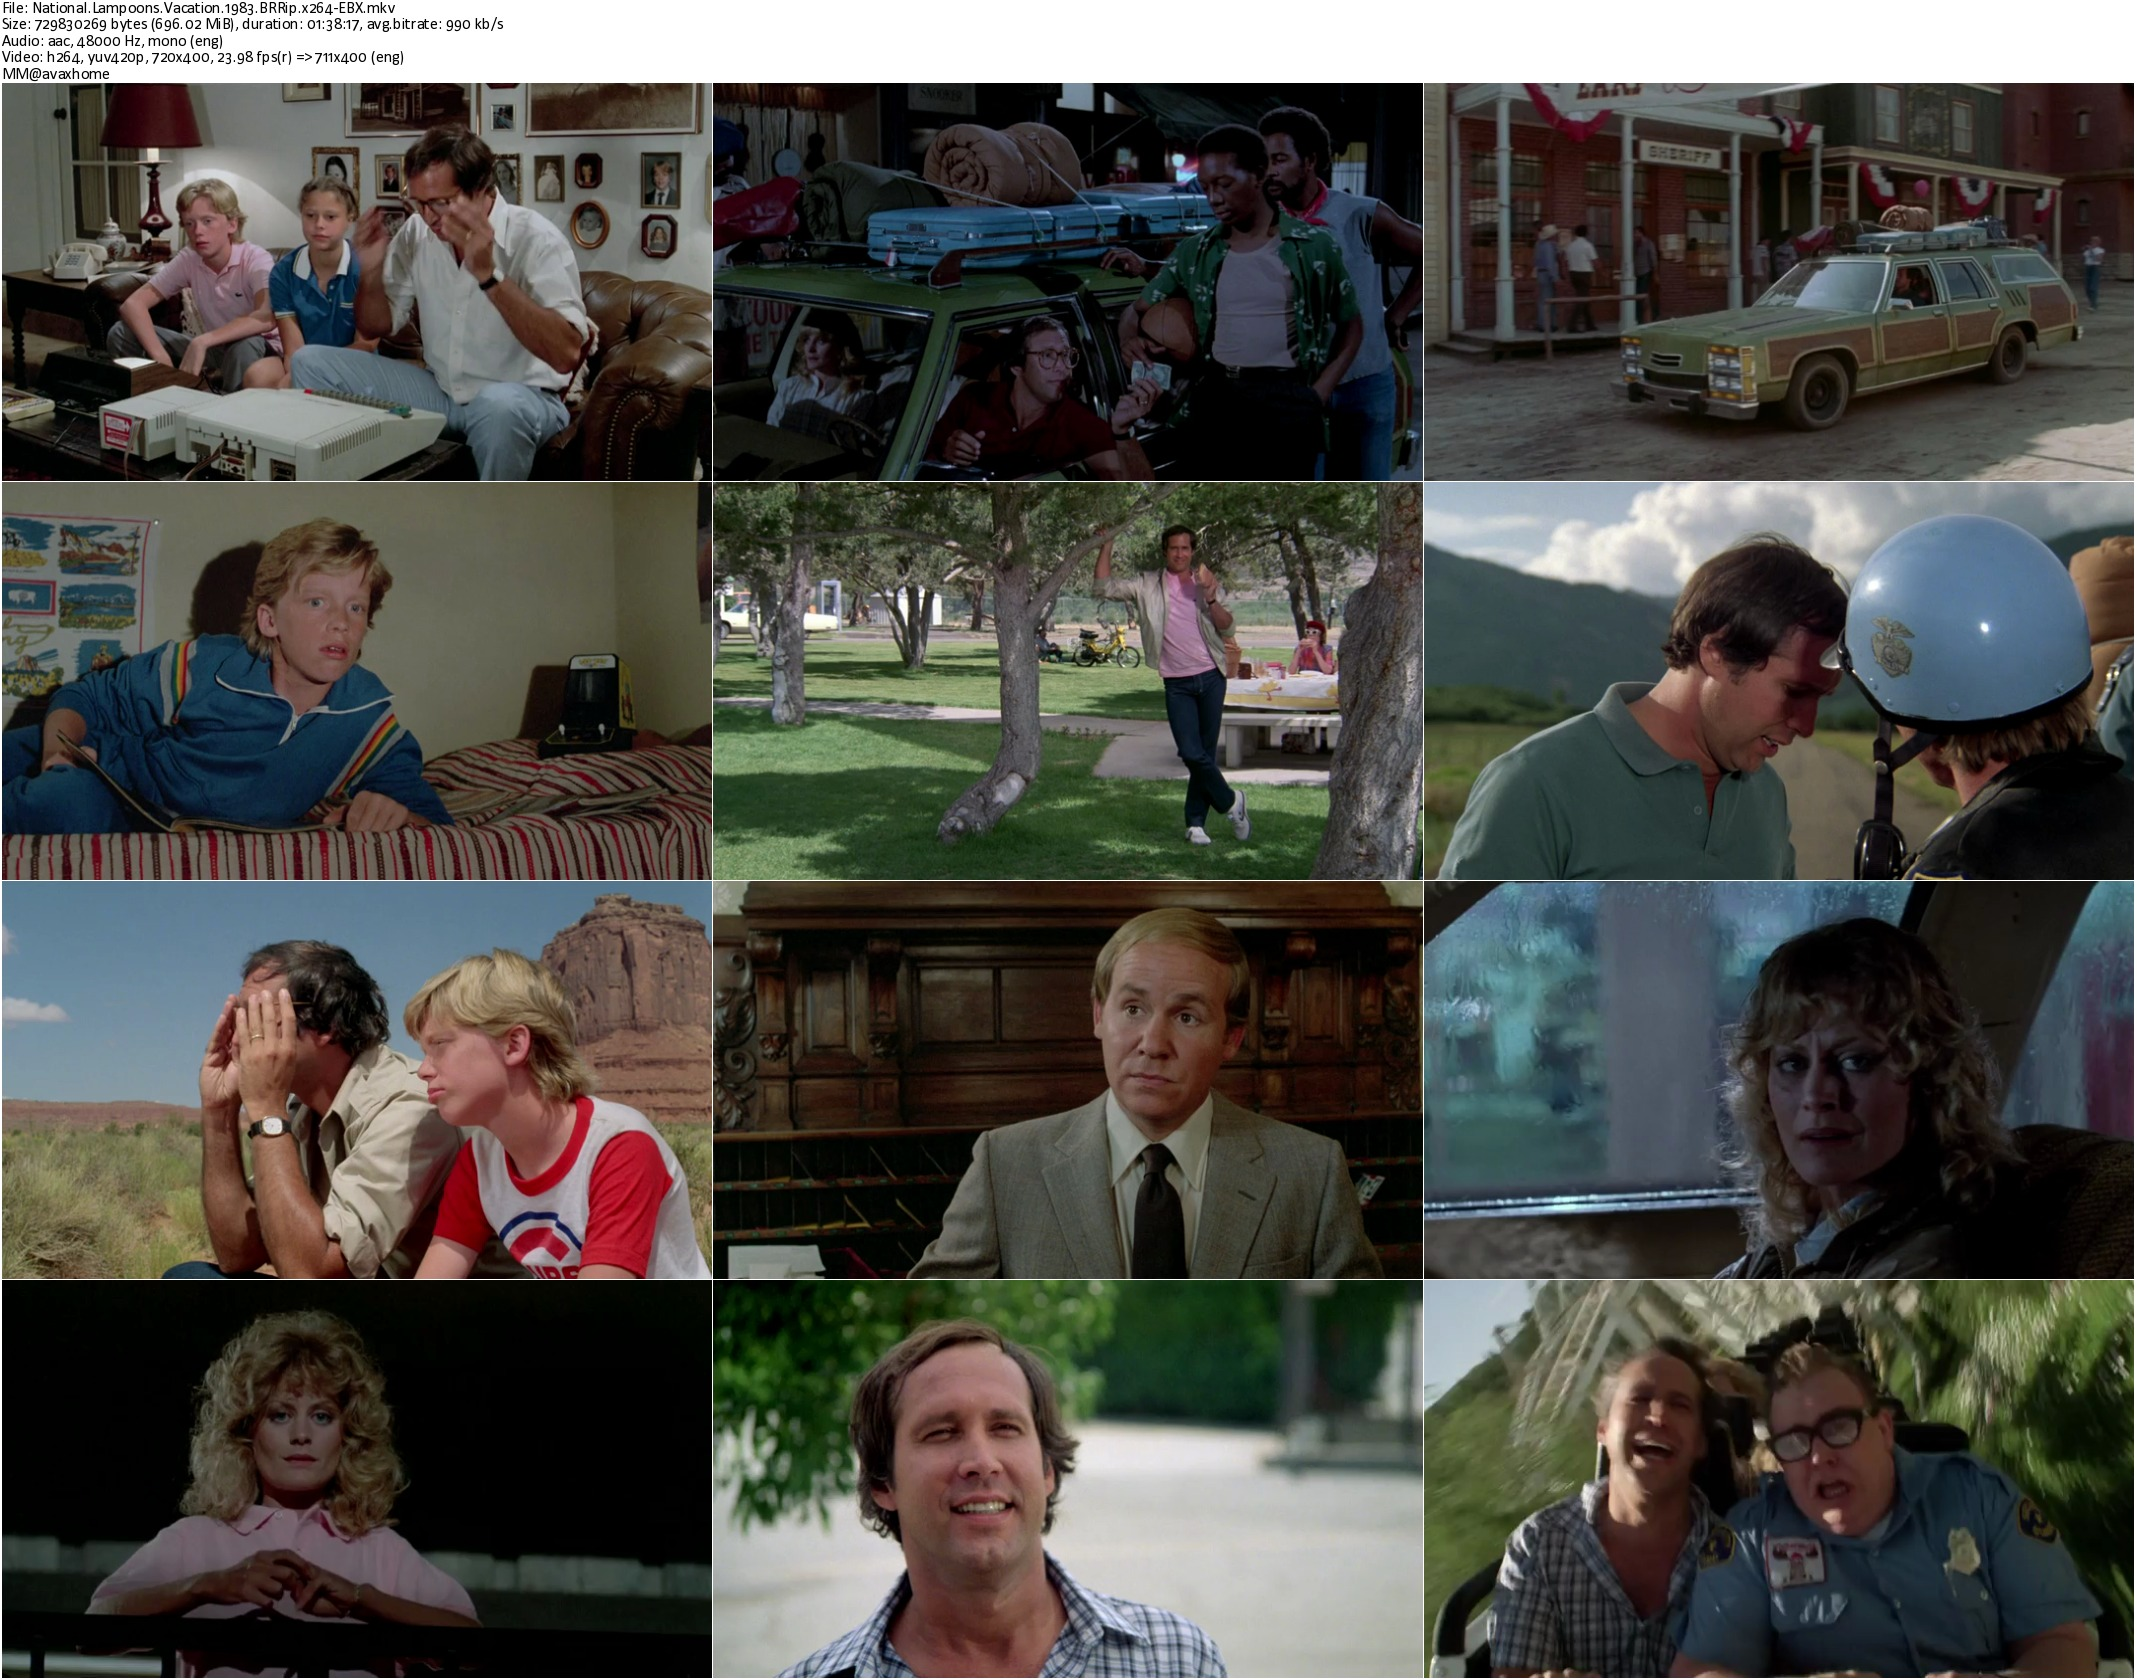 National Lampoon's Vacation (1983) / AvaxHome